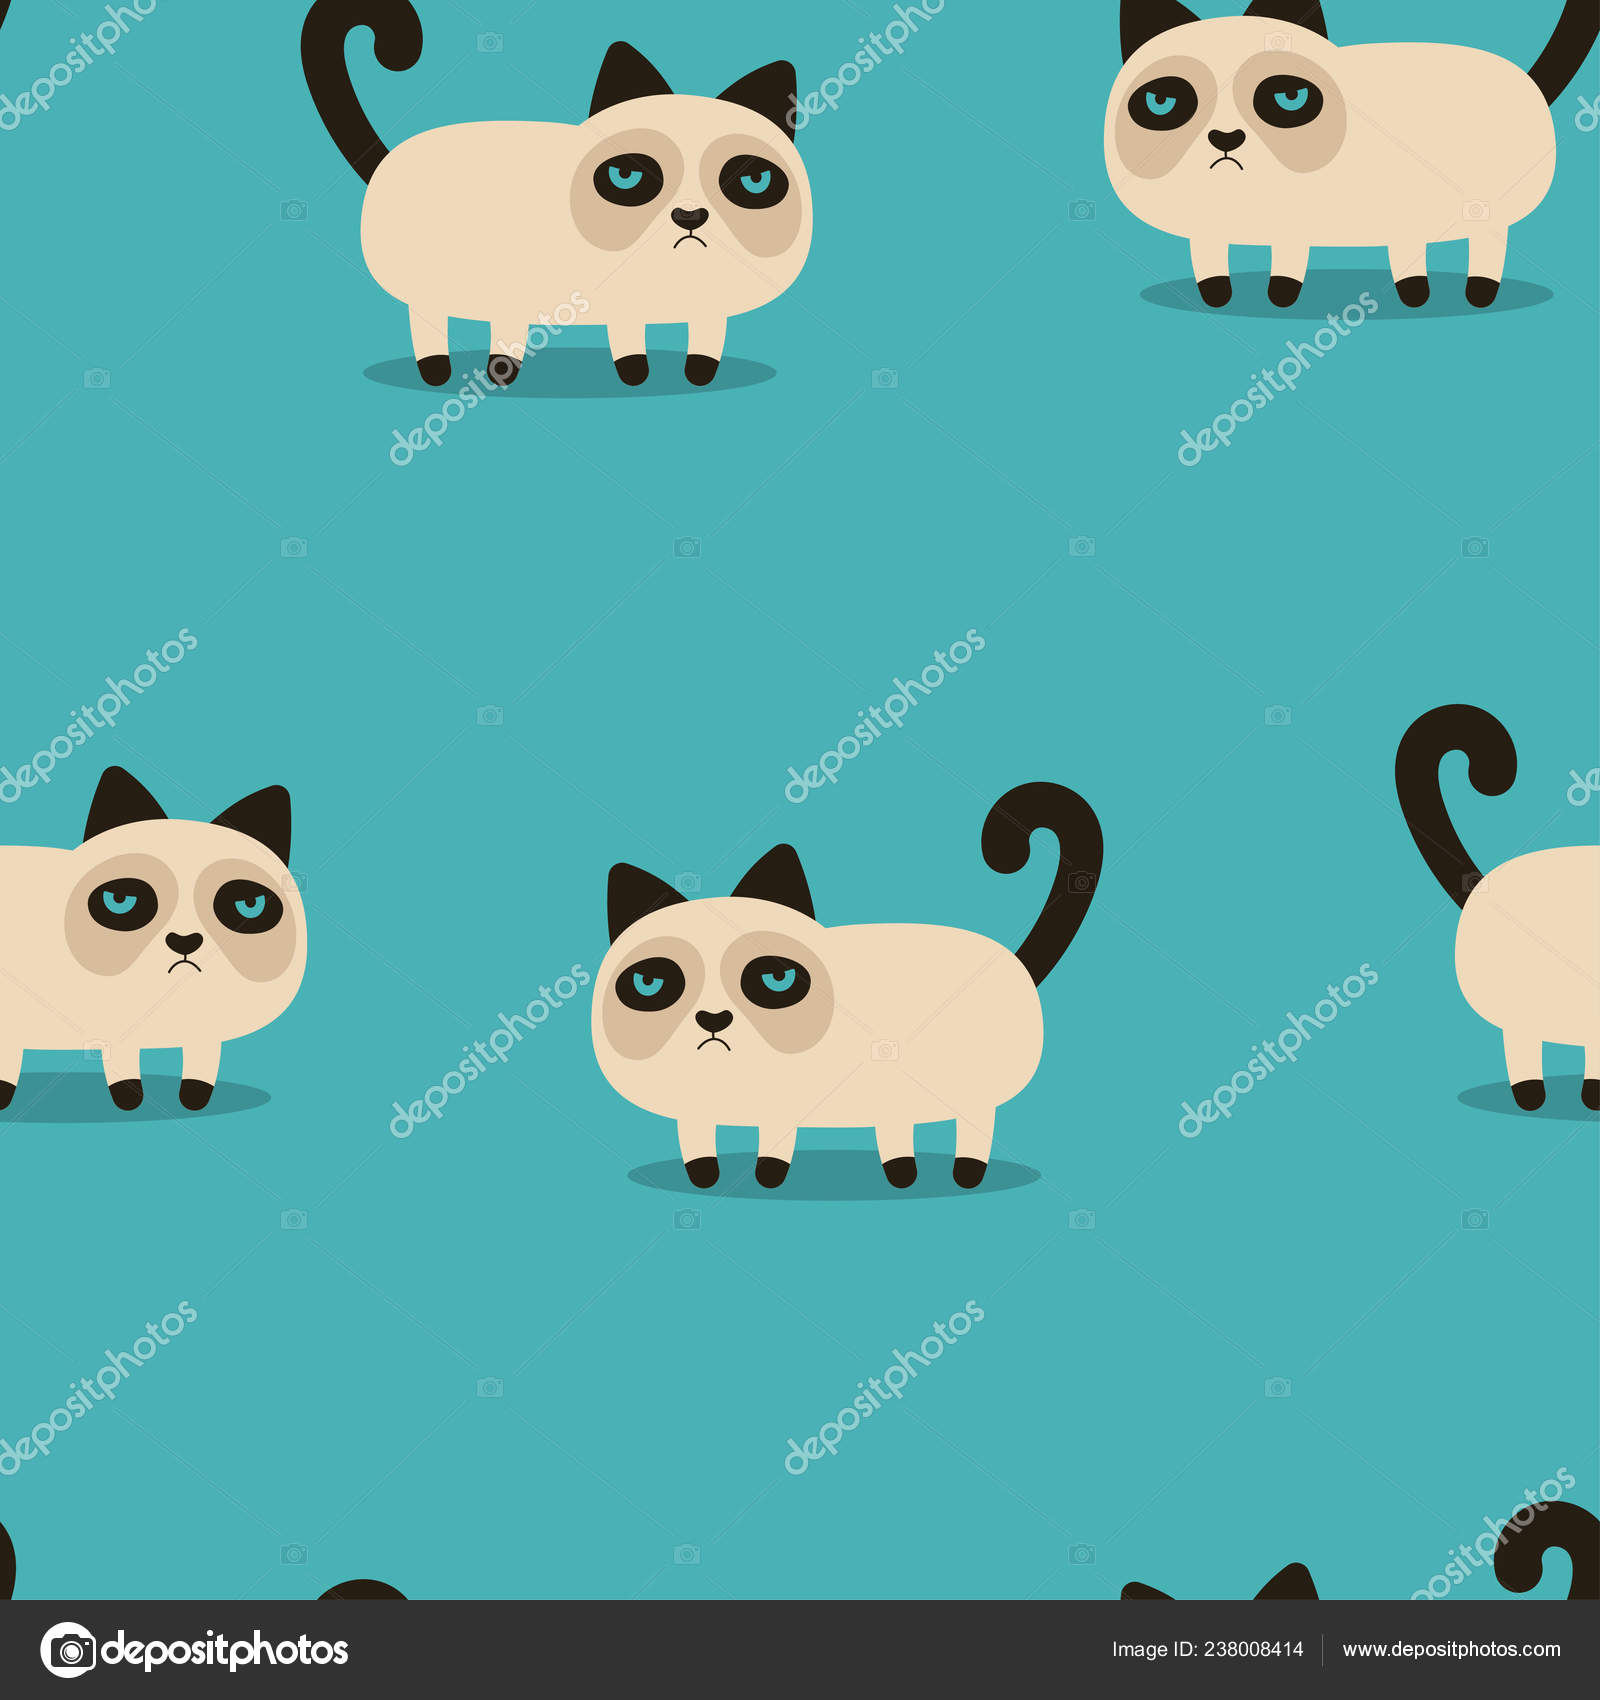 Pictures Sad Cat Wallpaper Pattern Grumpy Cartoon Cat